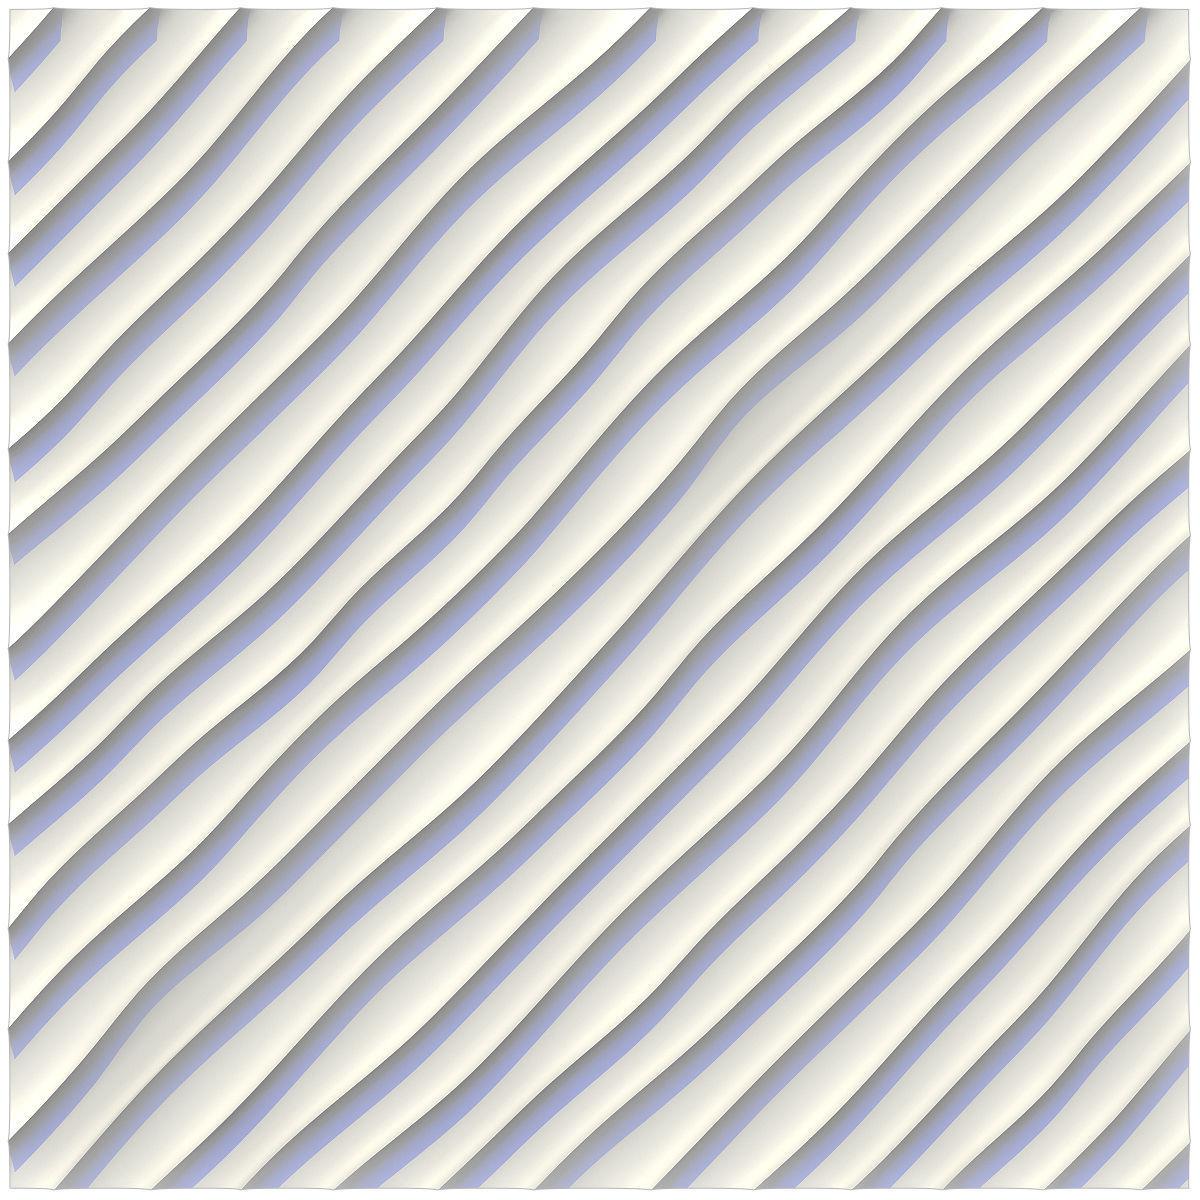 sandy ripples diagonal waves